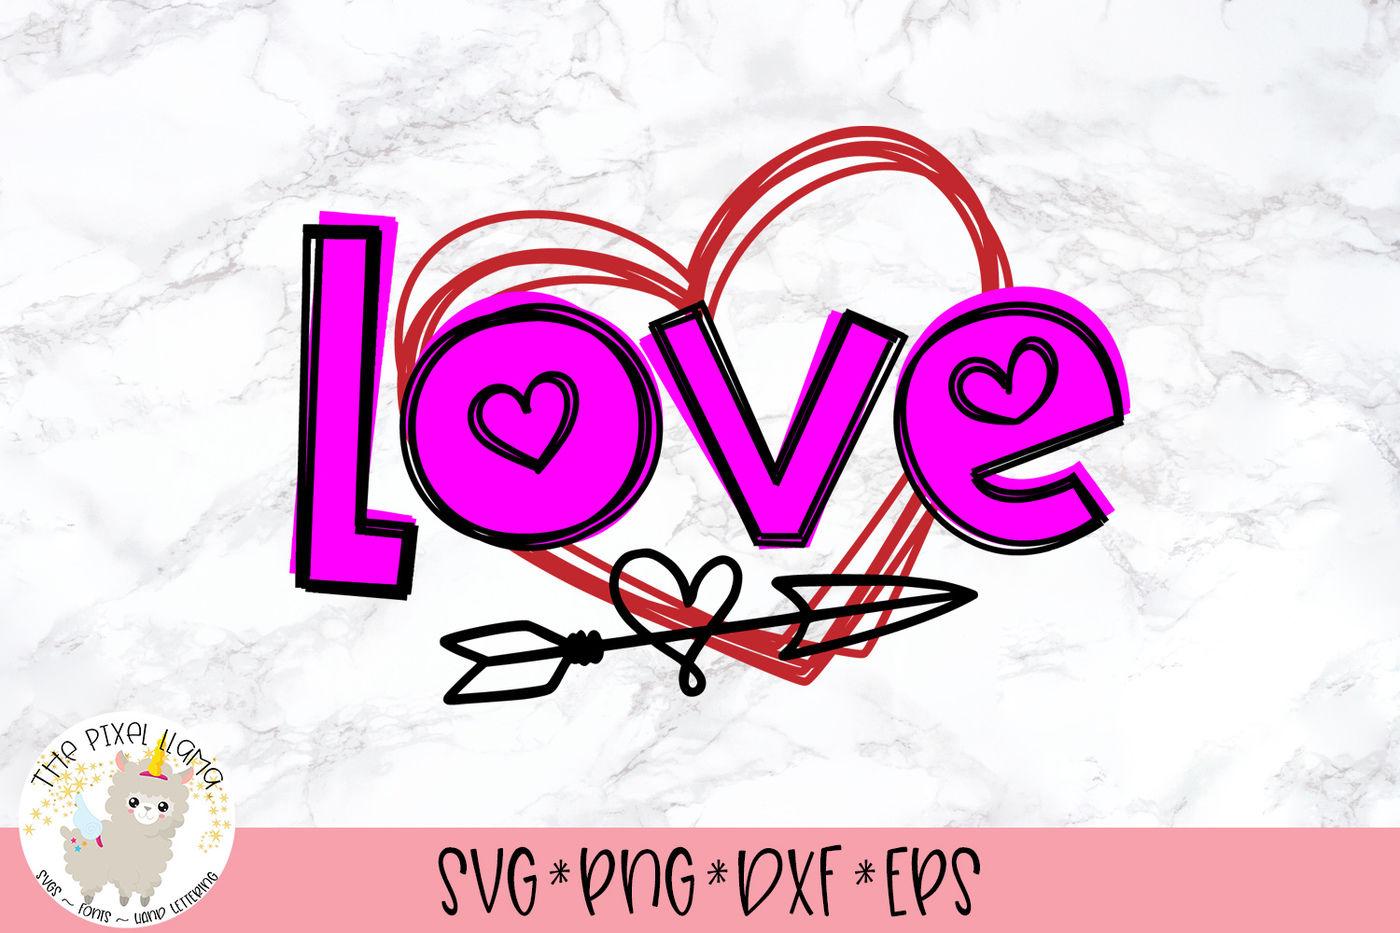 Love Heart Arrow Valentine Svg Cut File By The Pixel Llama